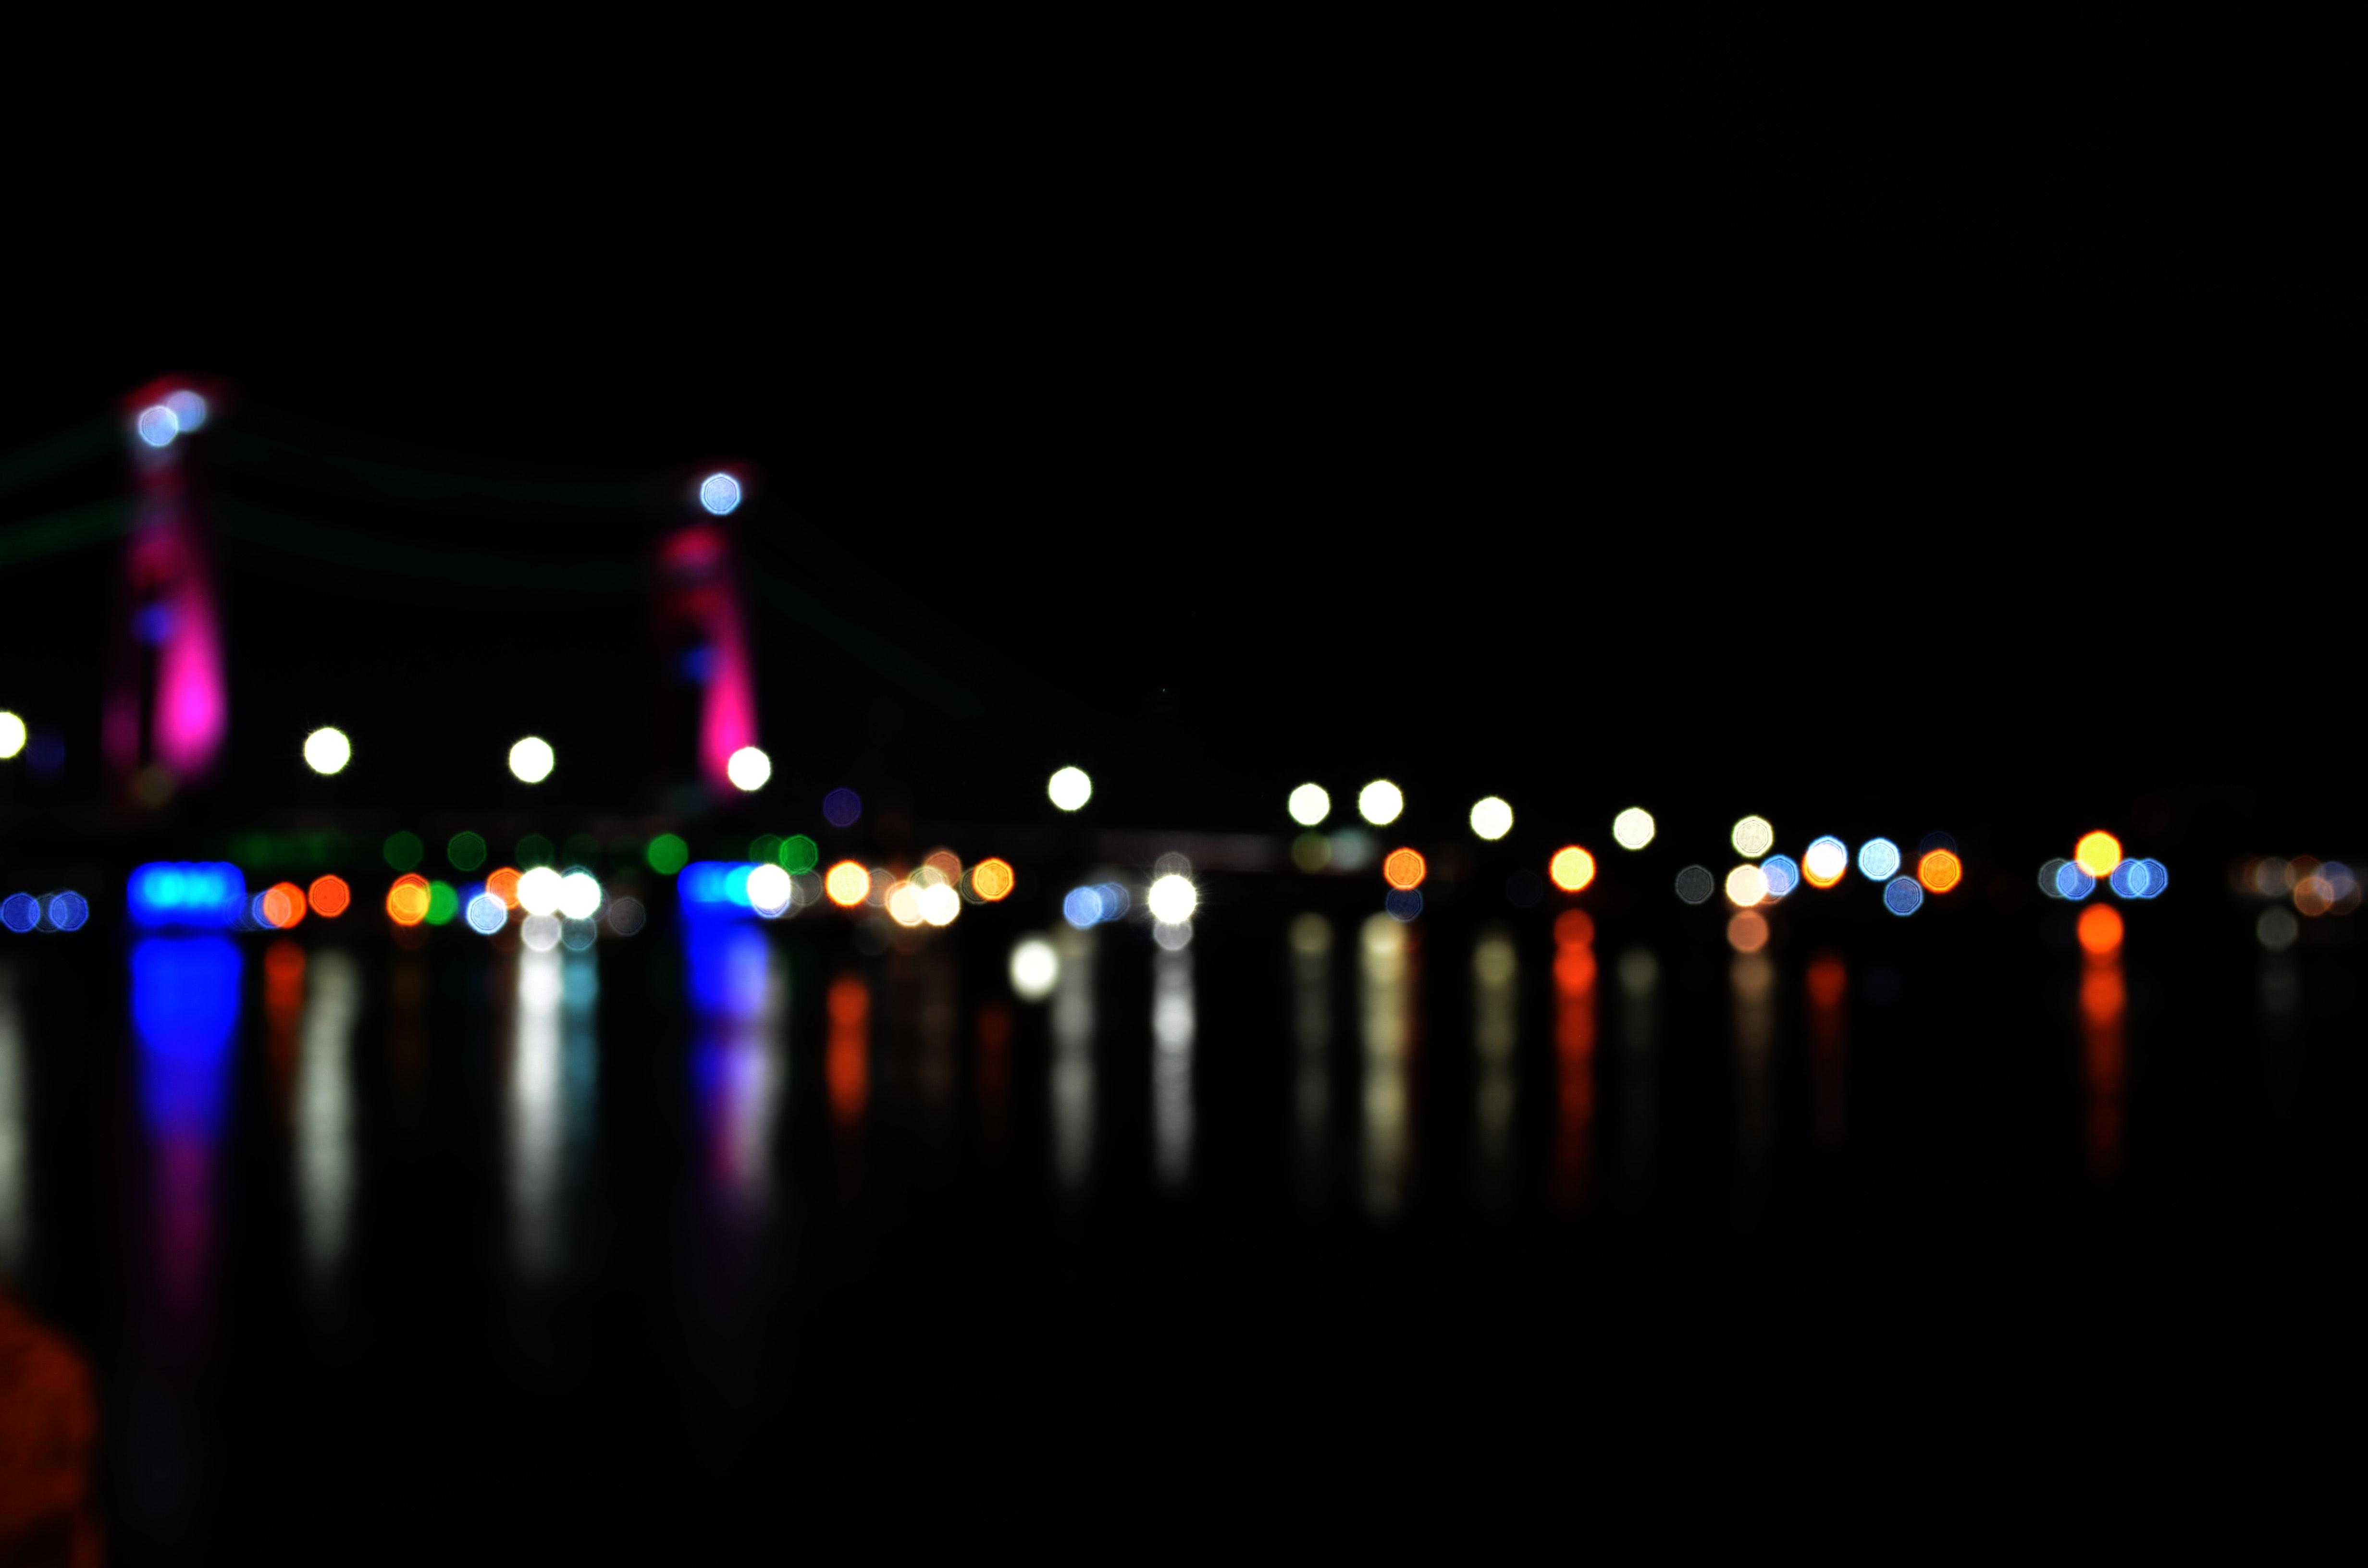 Defocused image of illuminated lights at night photo